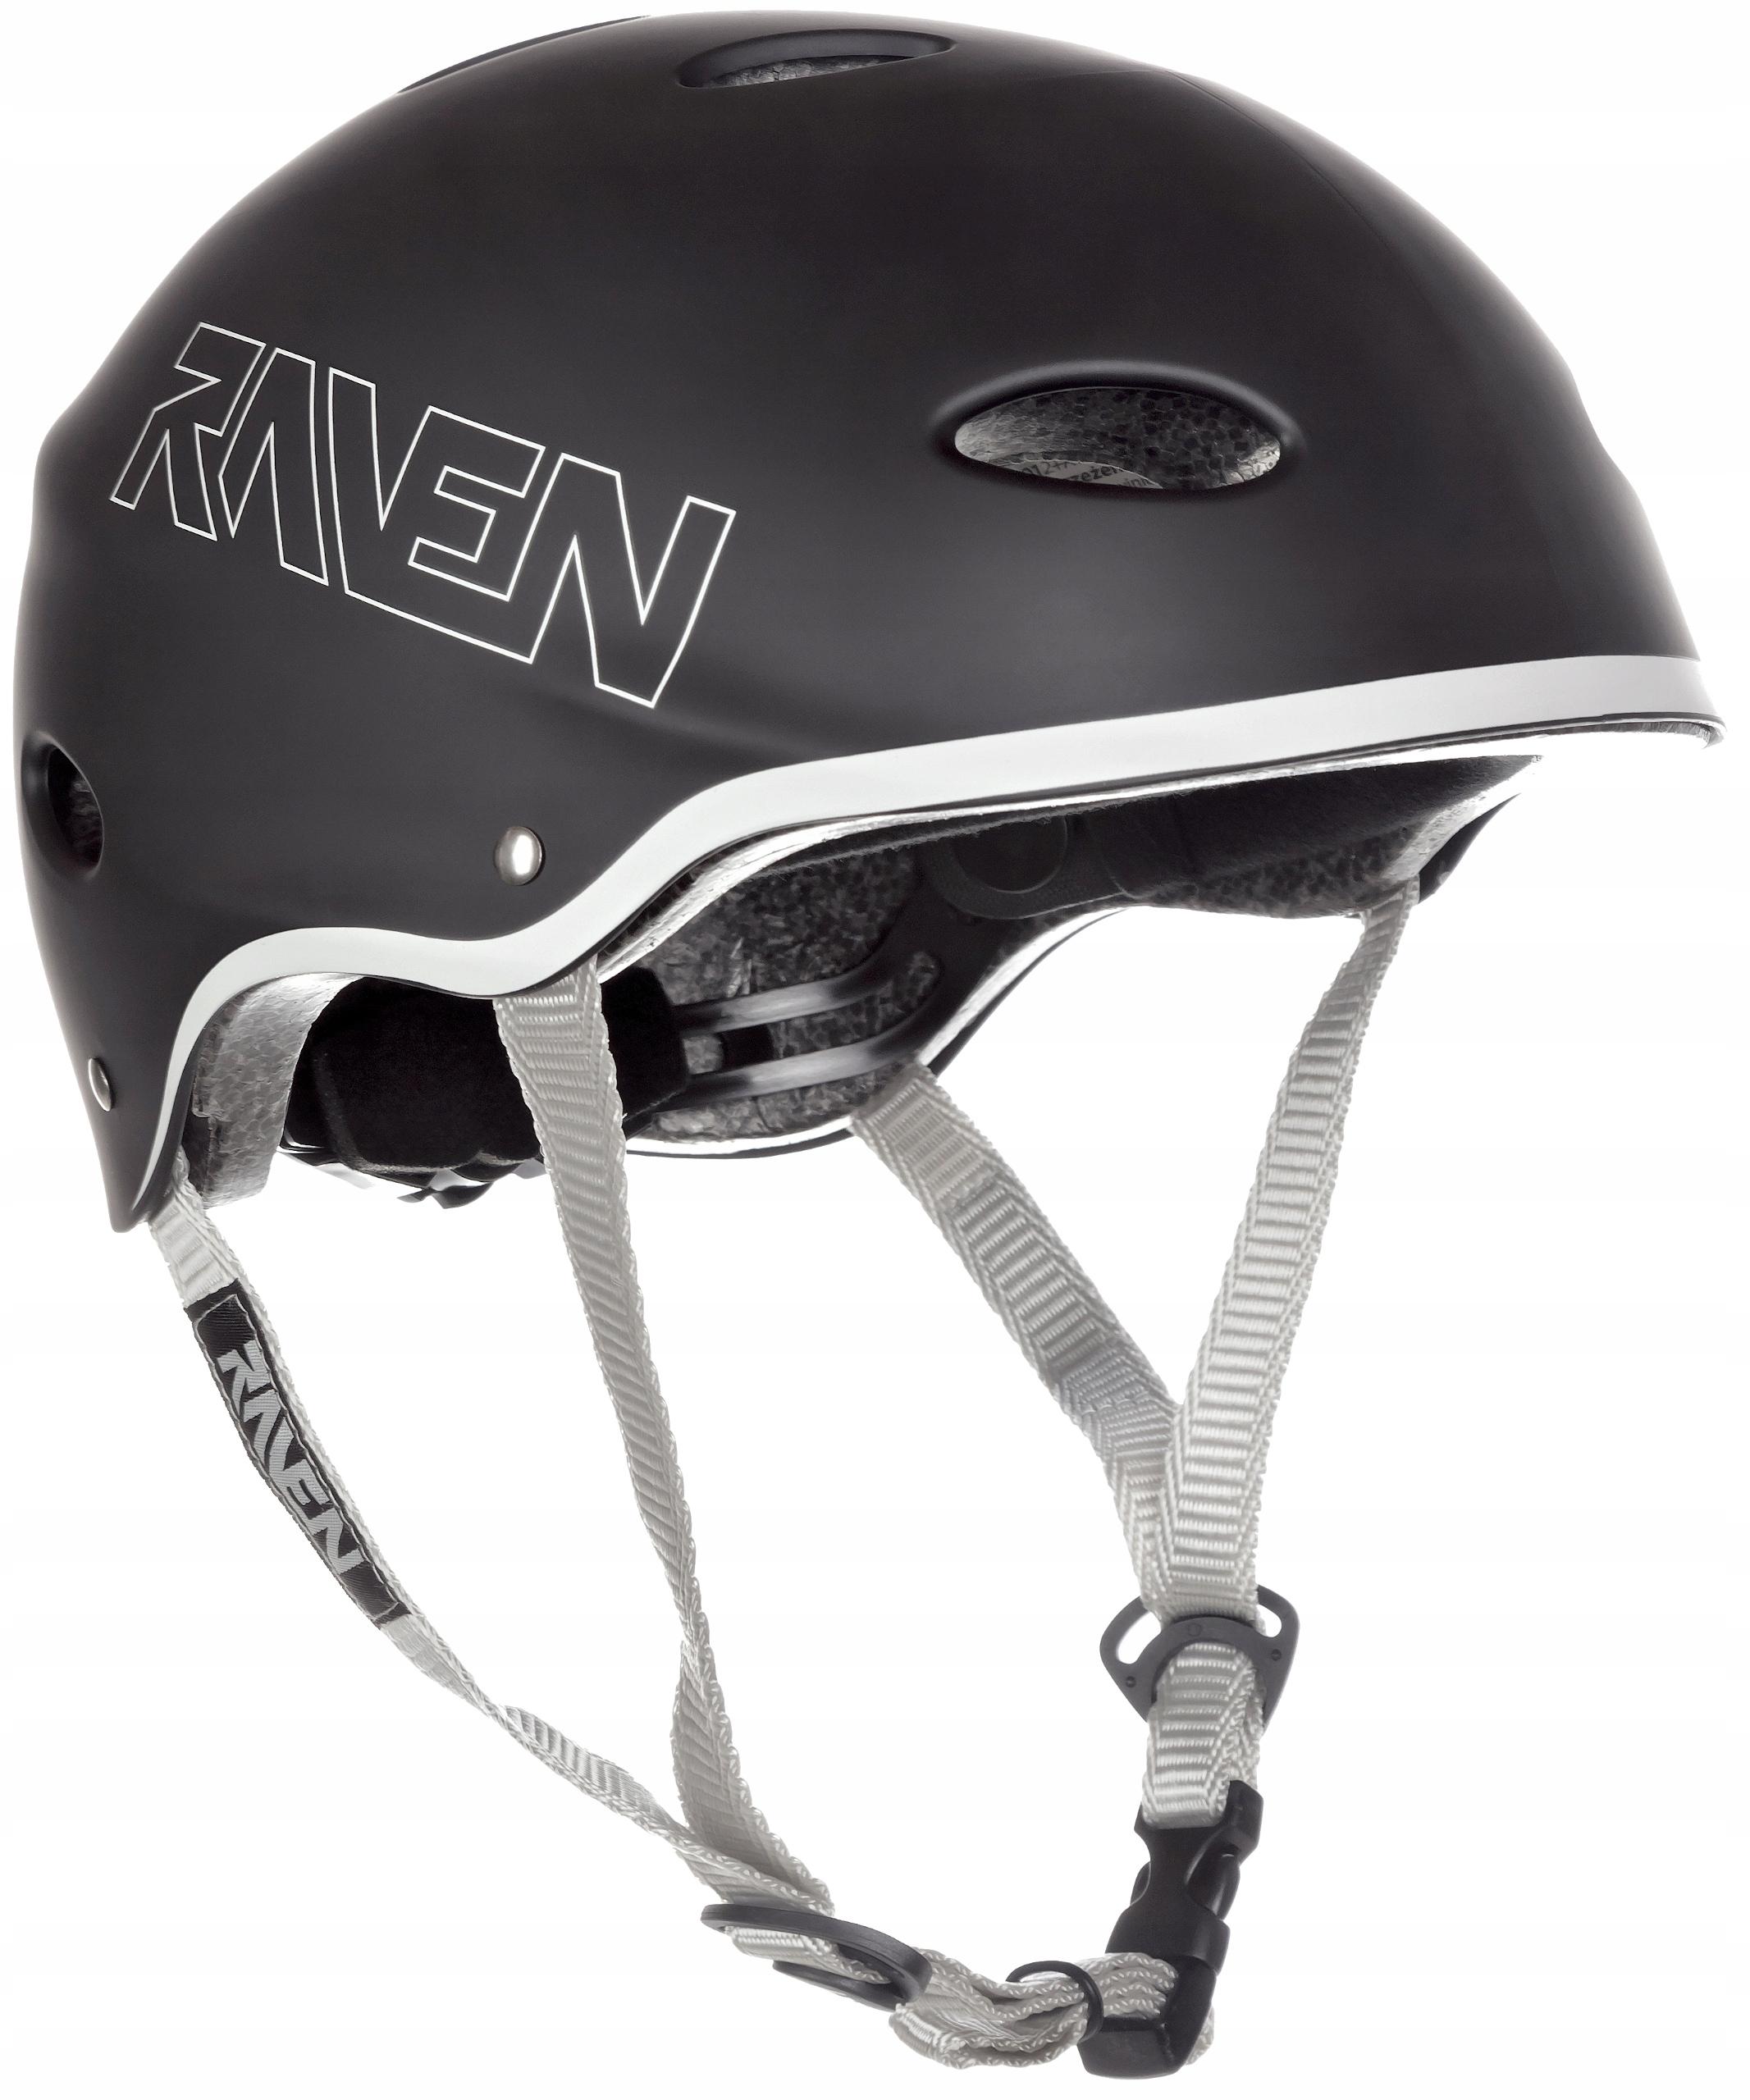 Kask Skateboardowy RAVEN F511 Black M (56-58cm)